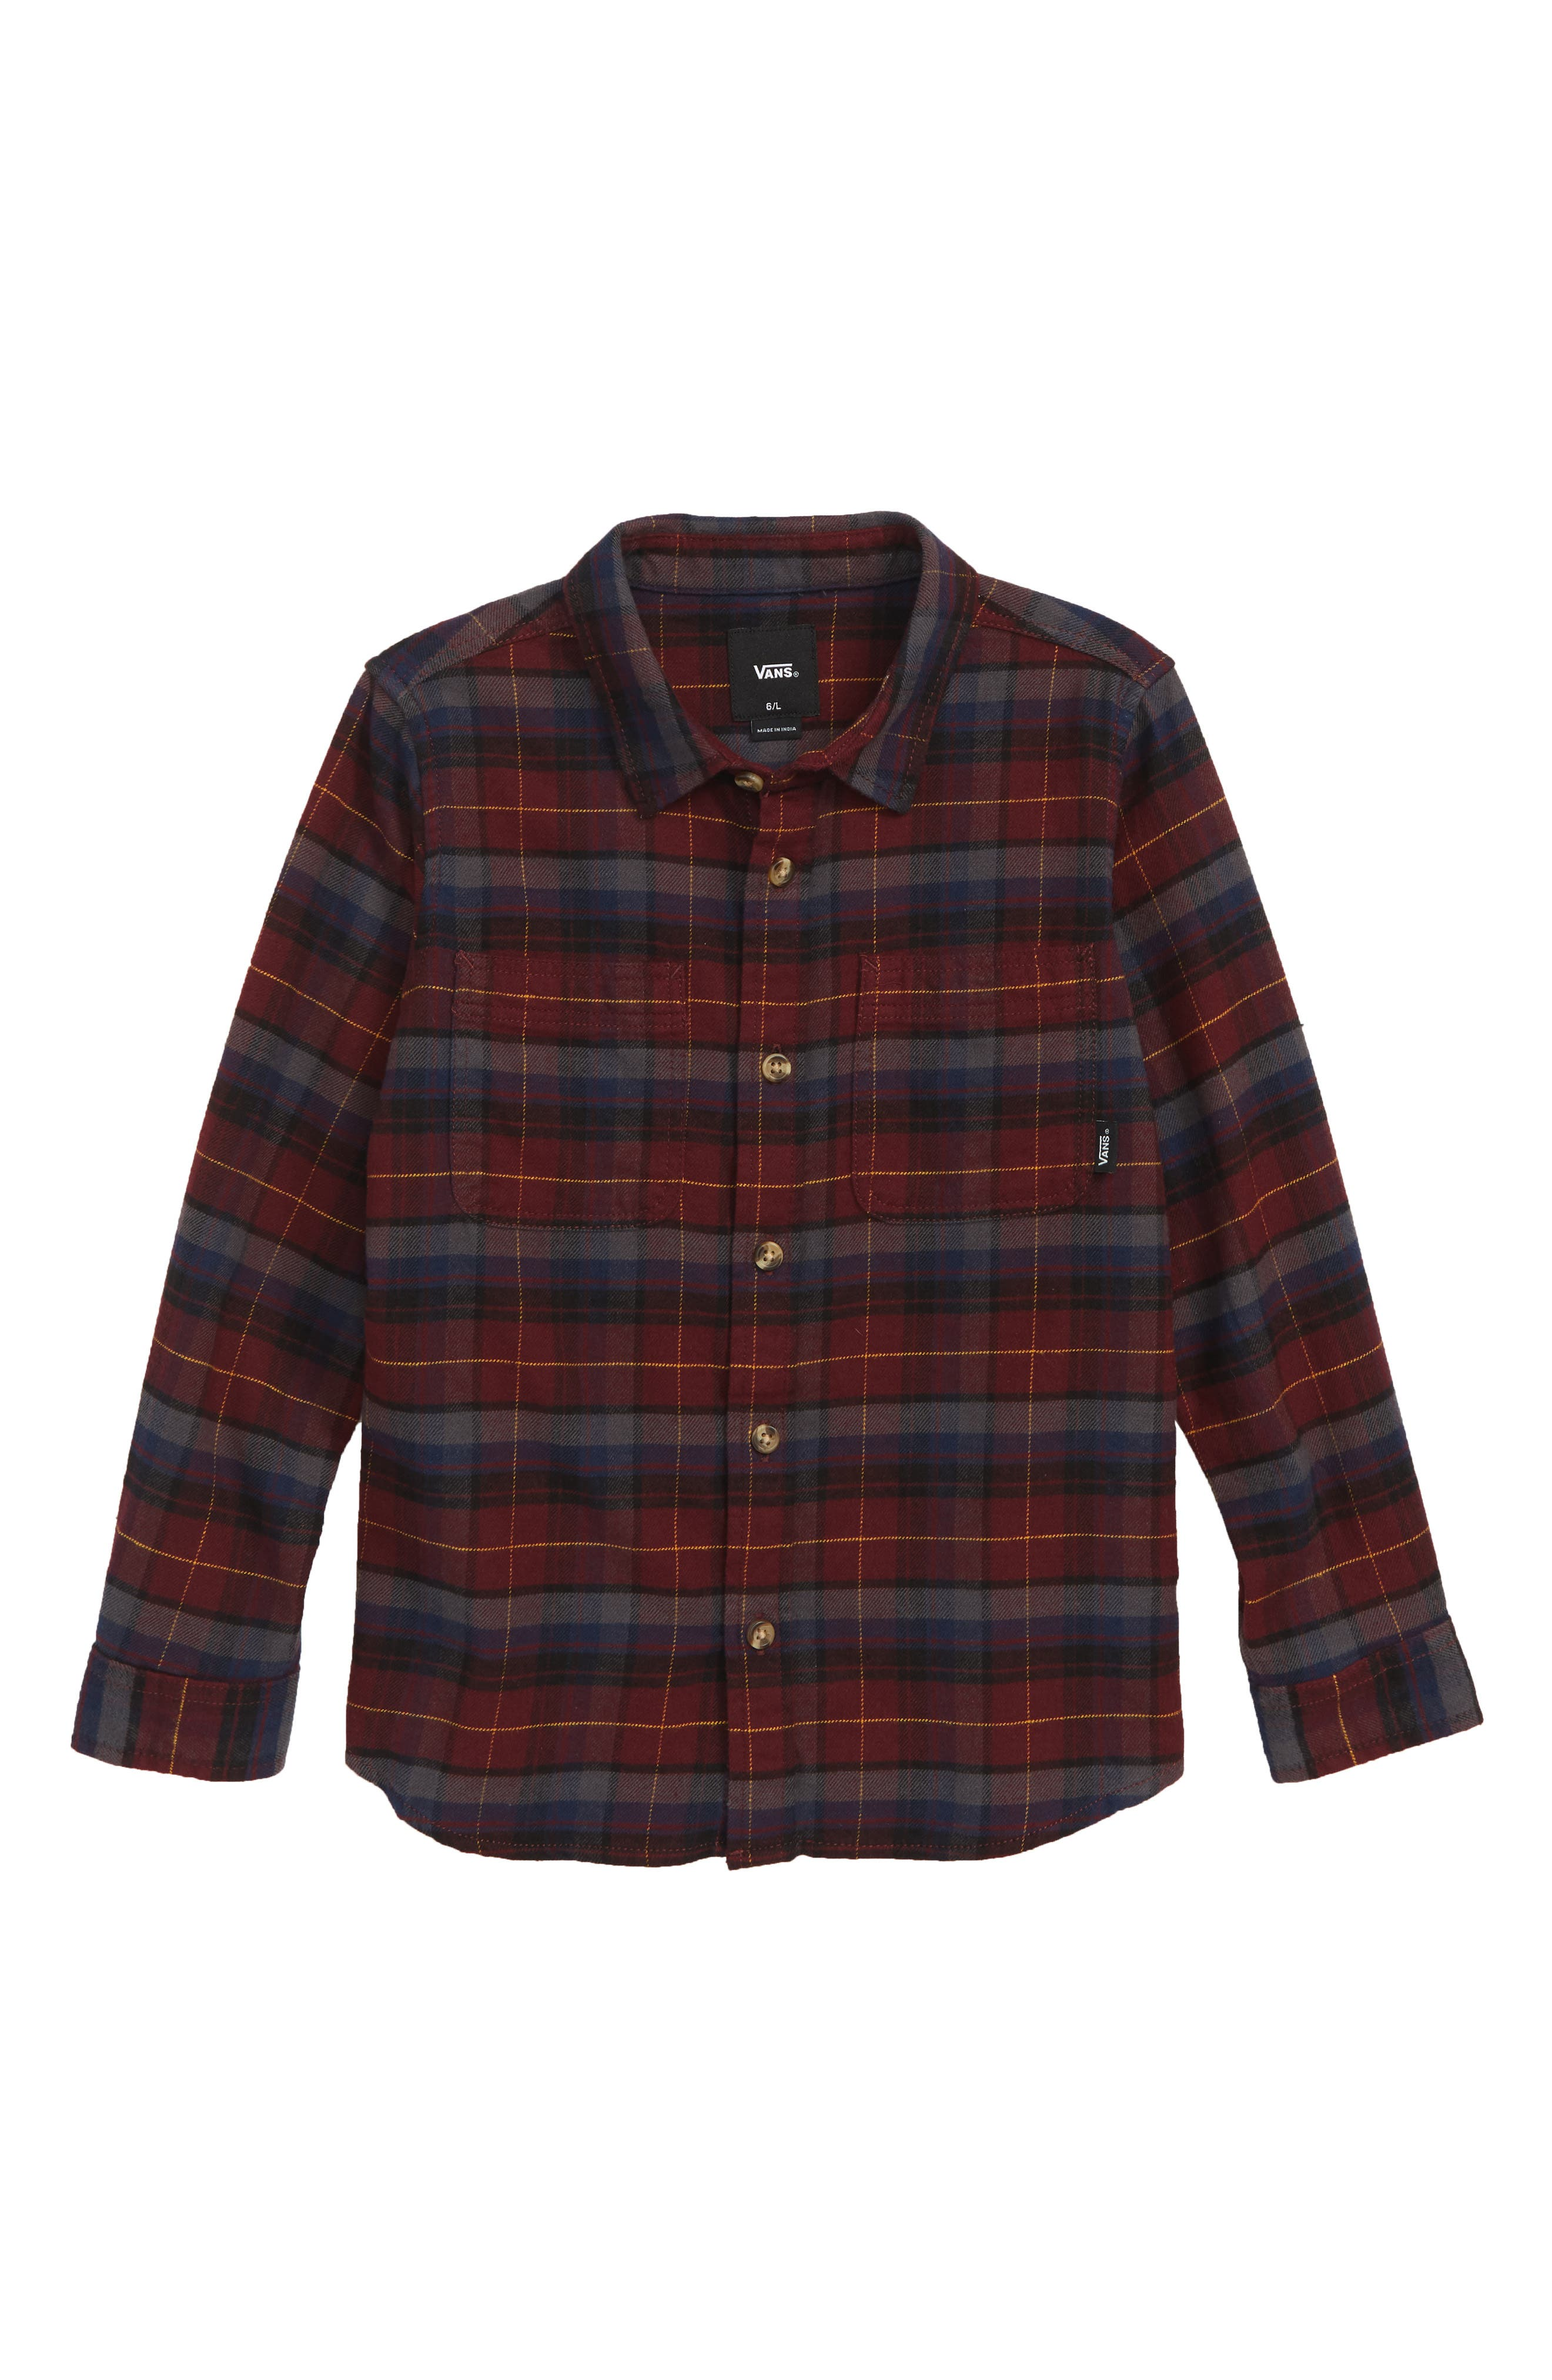 Banfield III Plaid Flannel Shirt,                             Main thumbnail 1, color,                             601